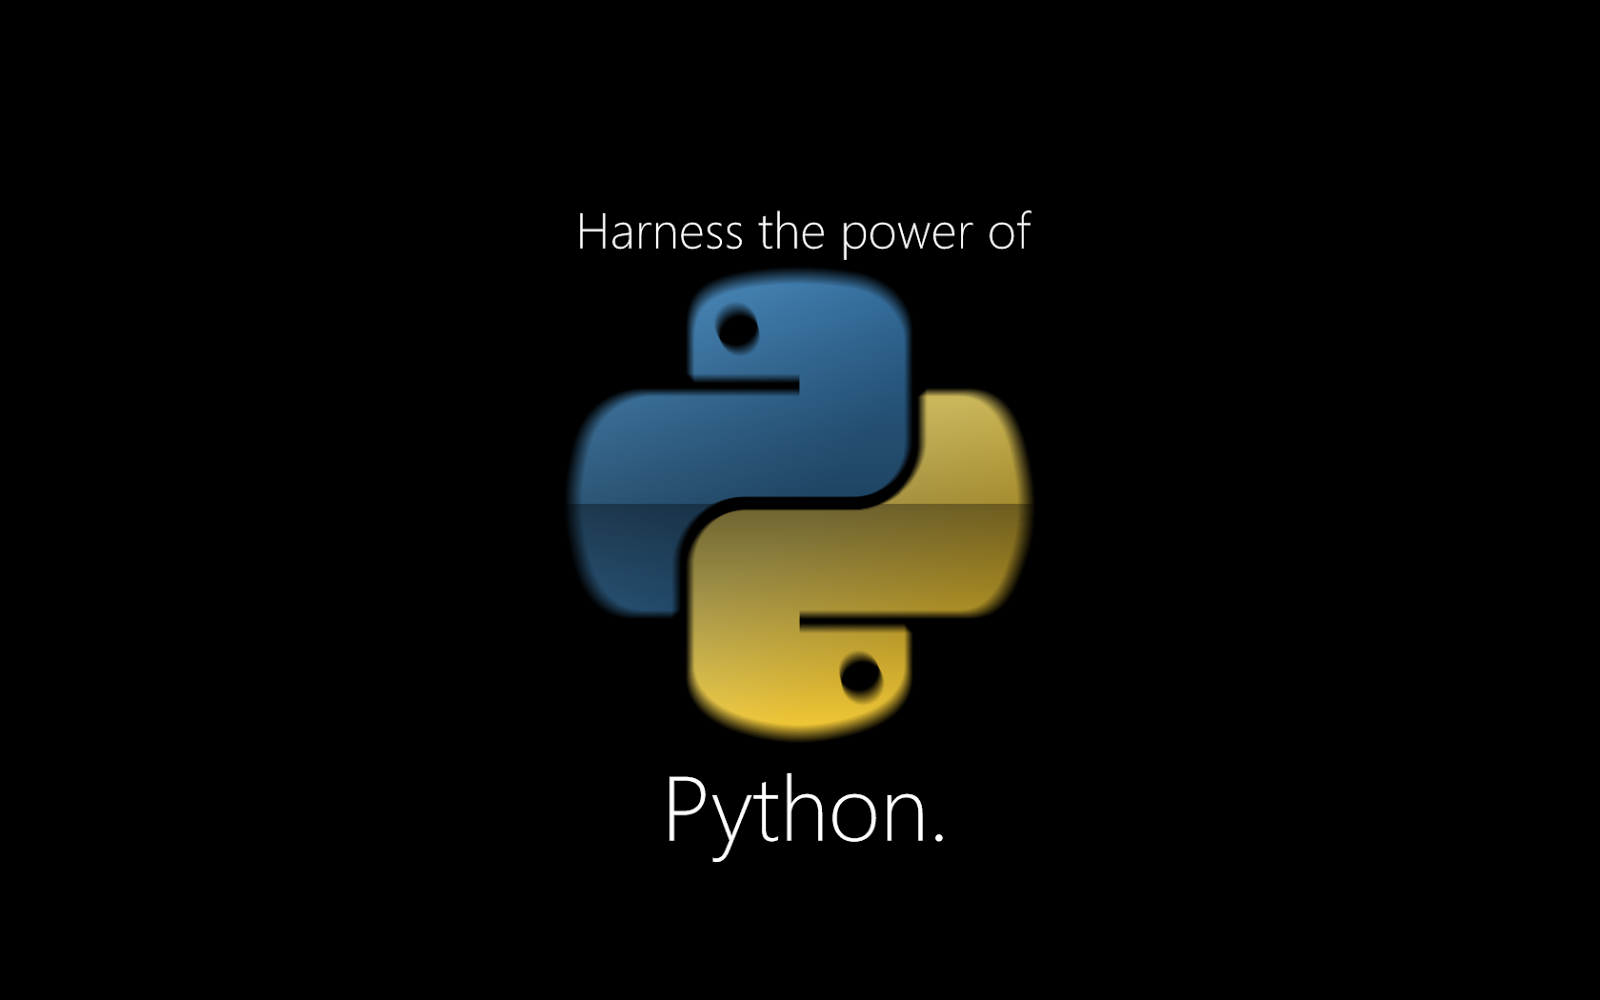 Python Programming Wallpaper 1600x1000